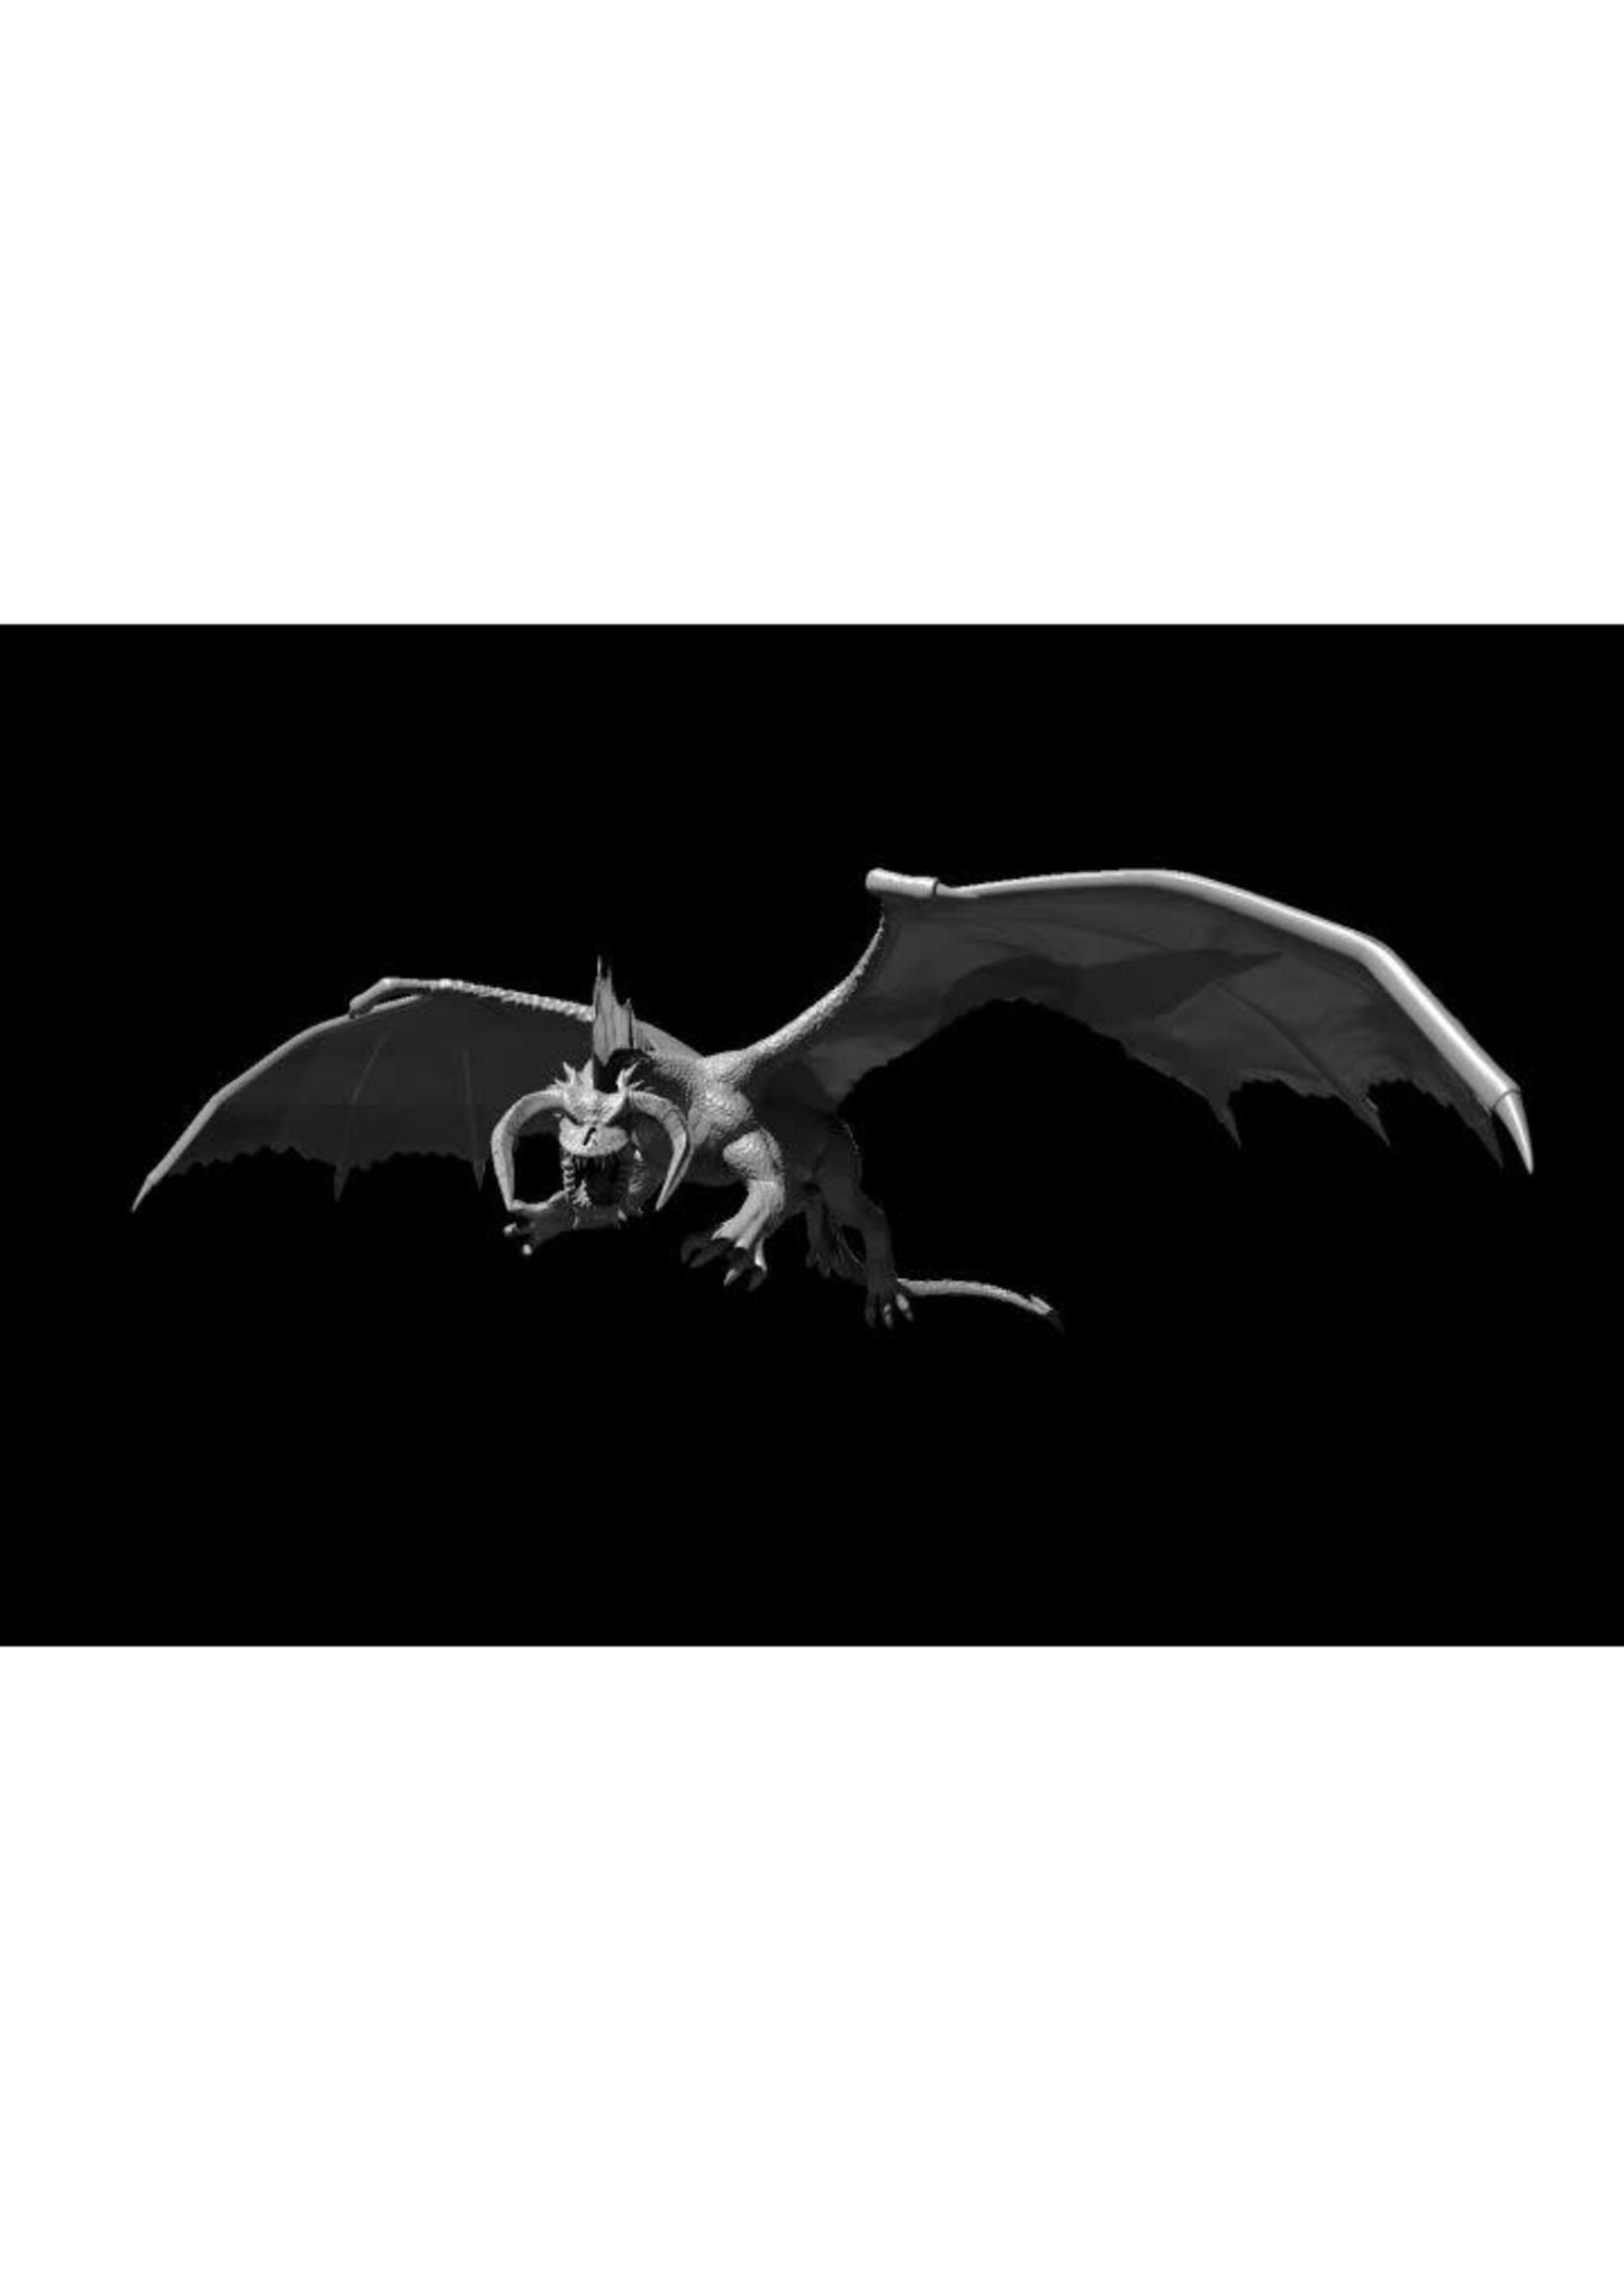 Black Dragon Adult Flying